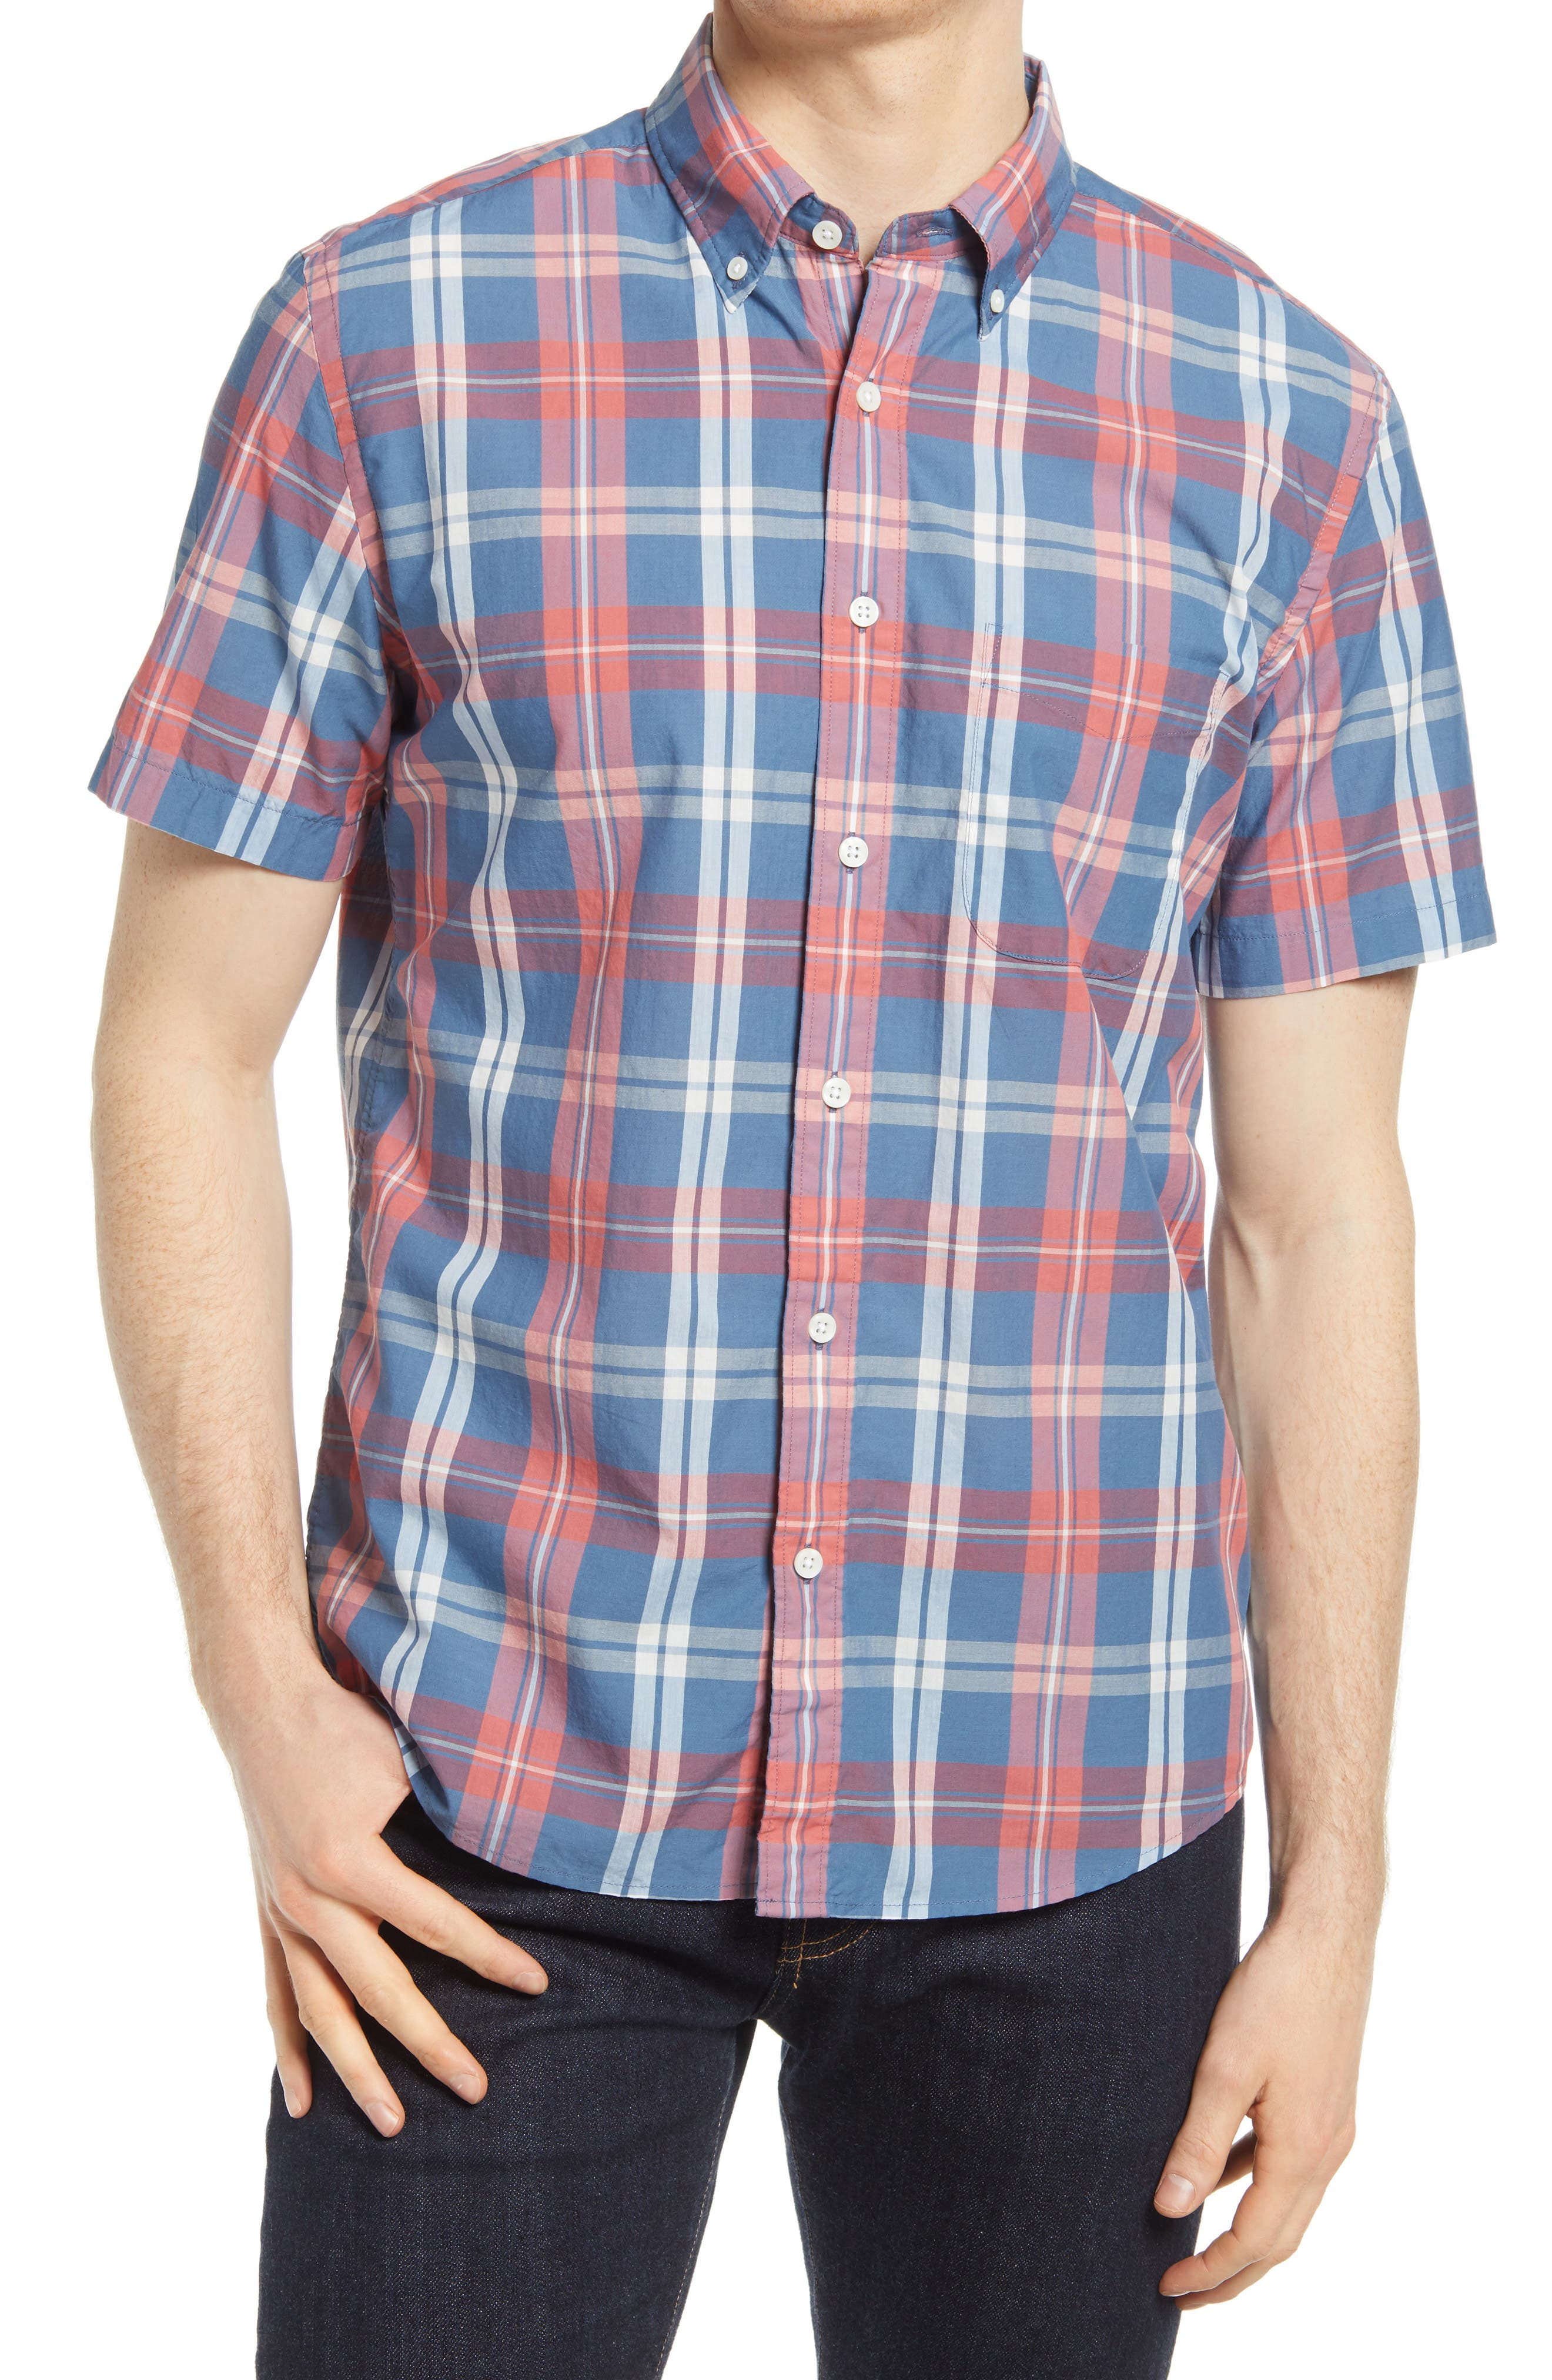 Playa Plaid Short Sleeve Button-Down Shirt